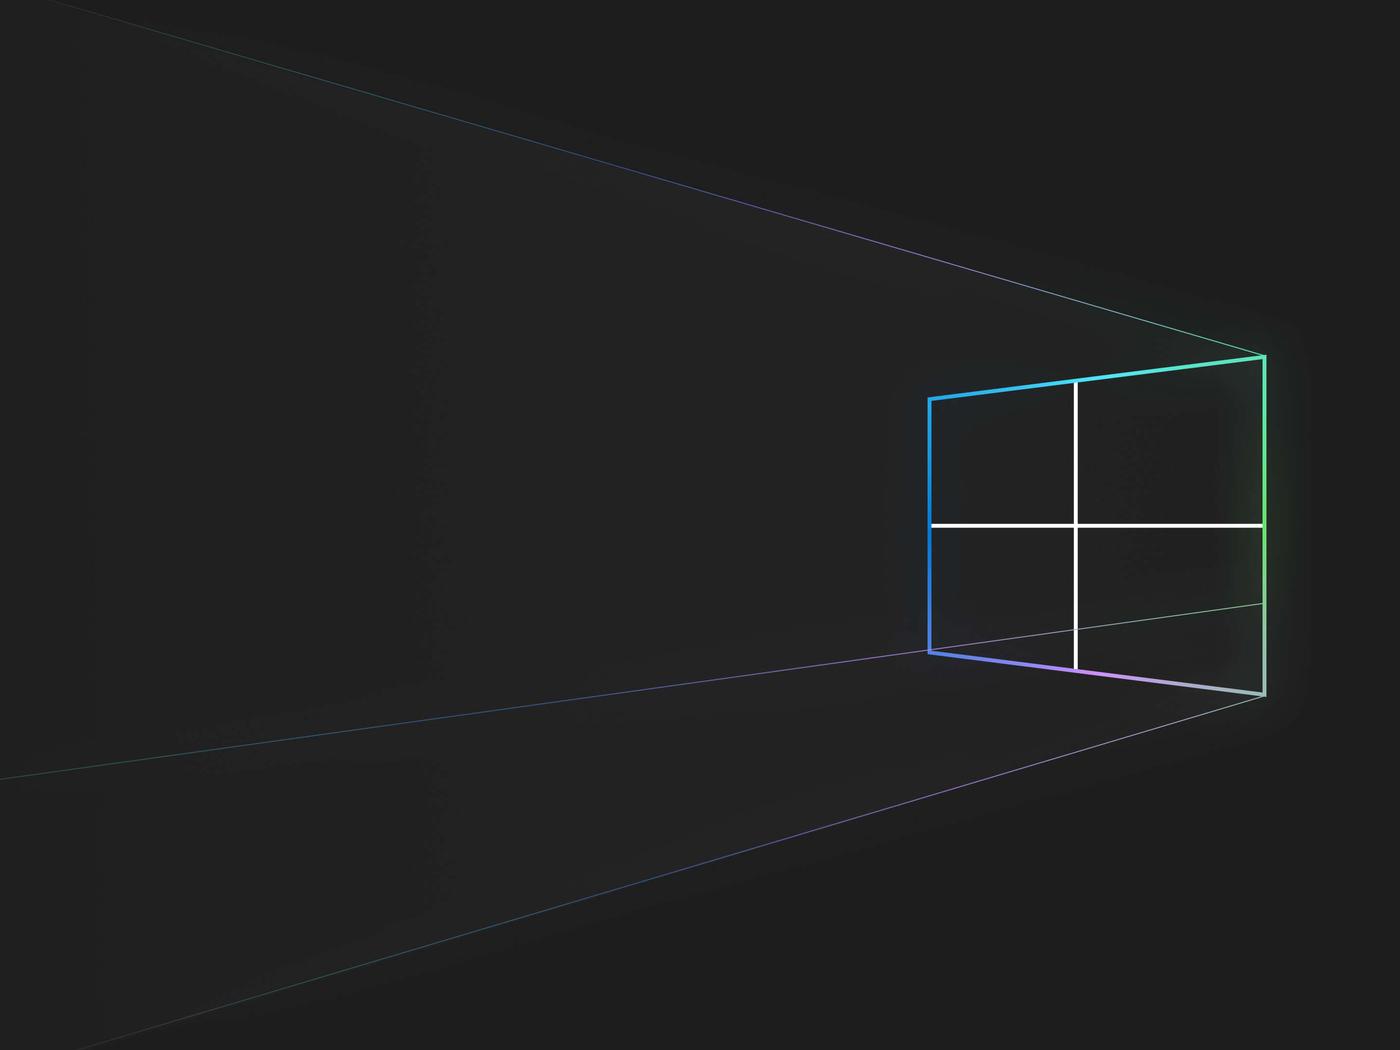 windows-fluent-lines-4k-b2.jpg